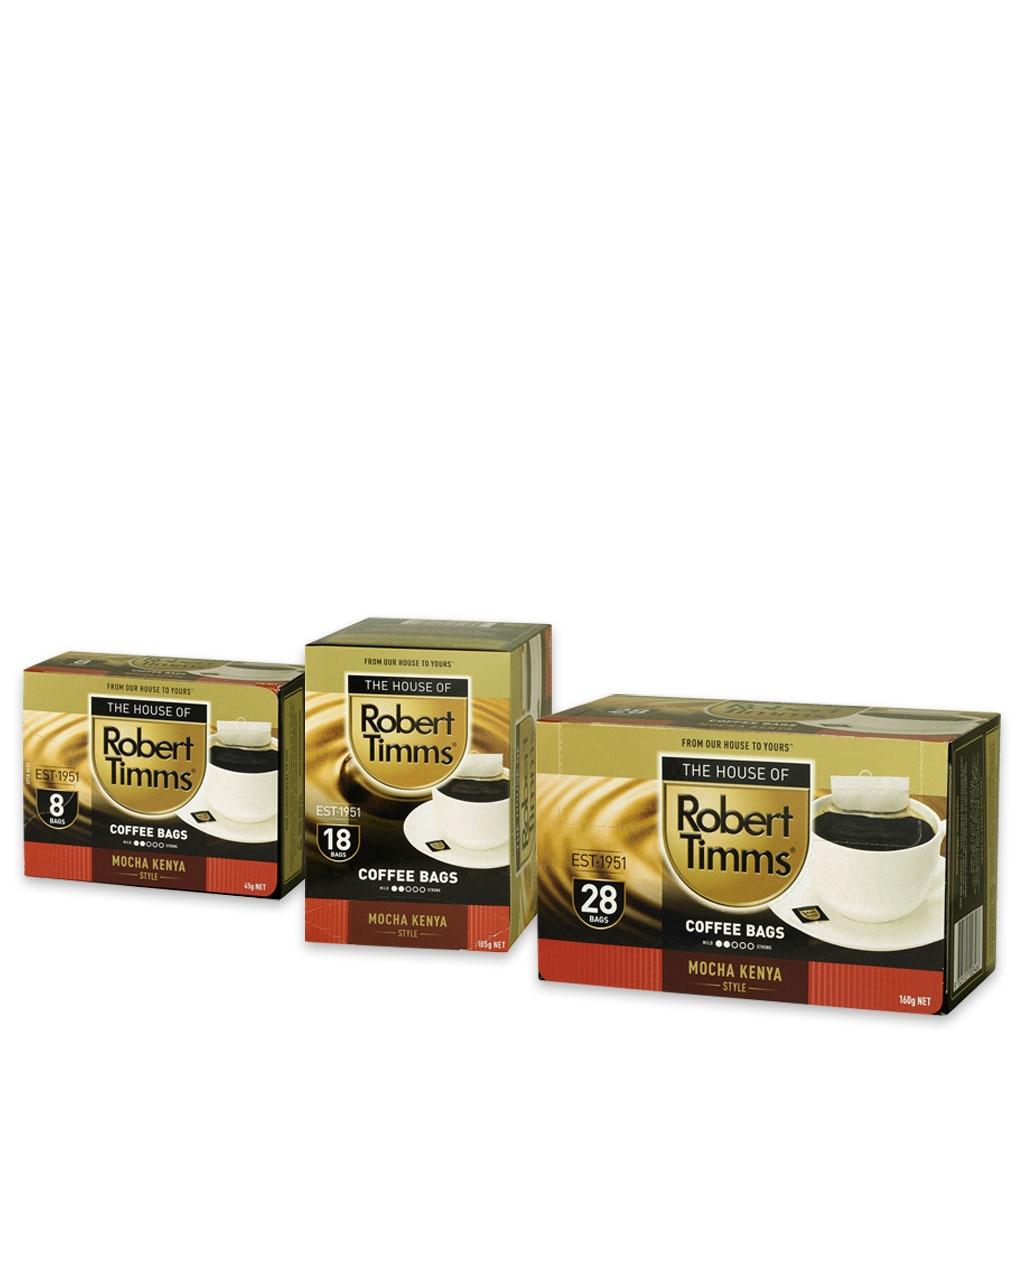 Mocha Kenya Coffee Bags